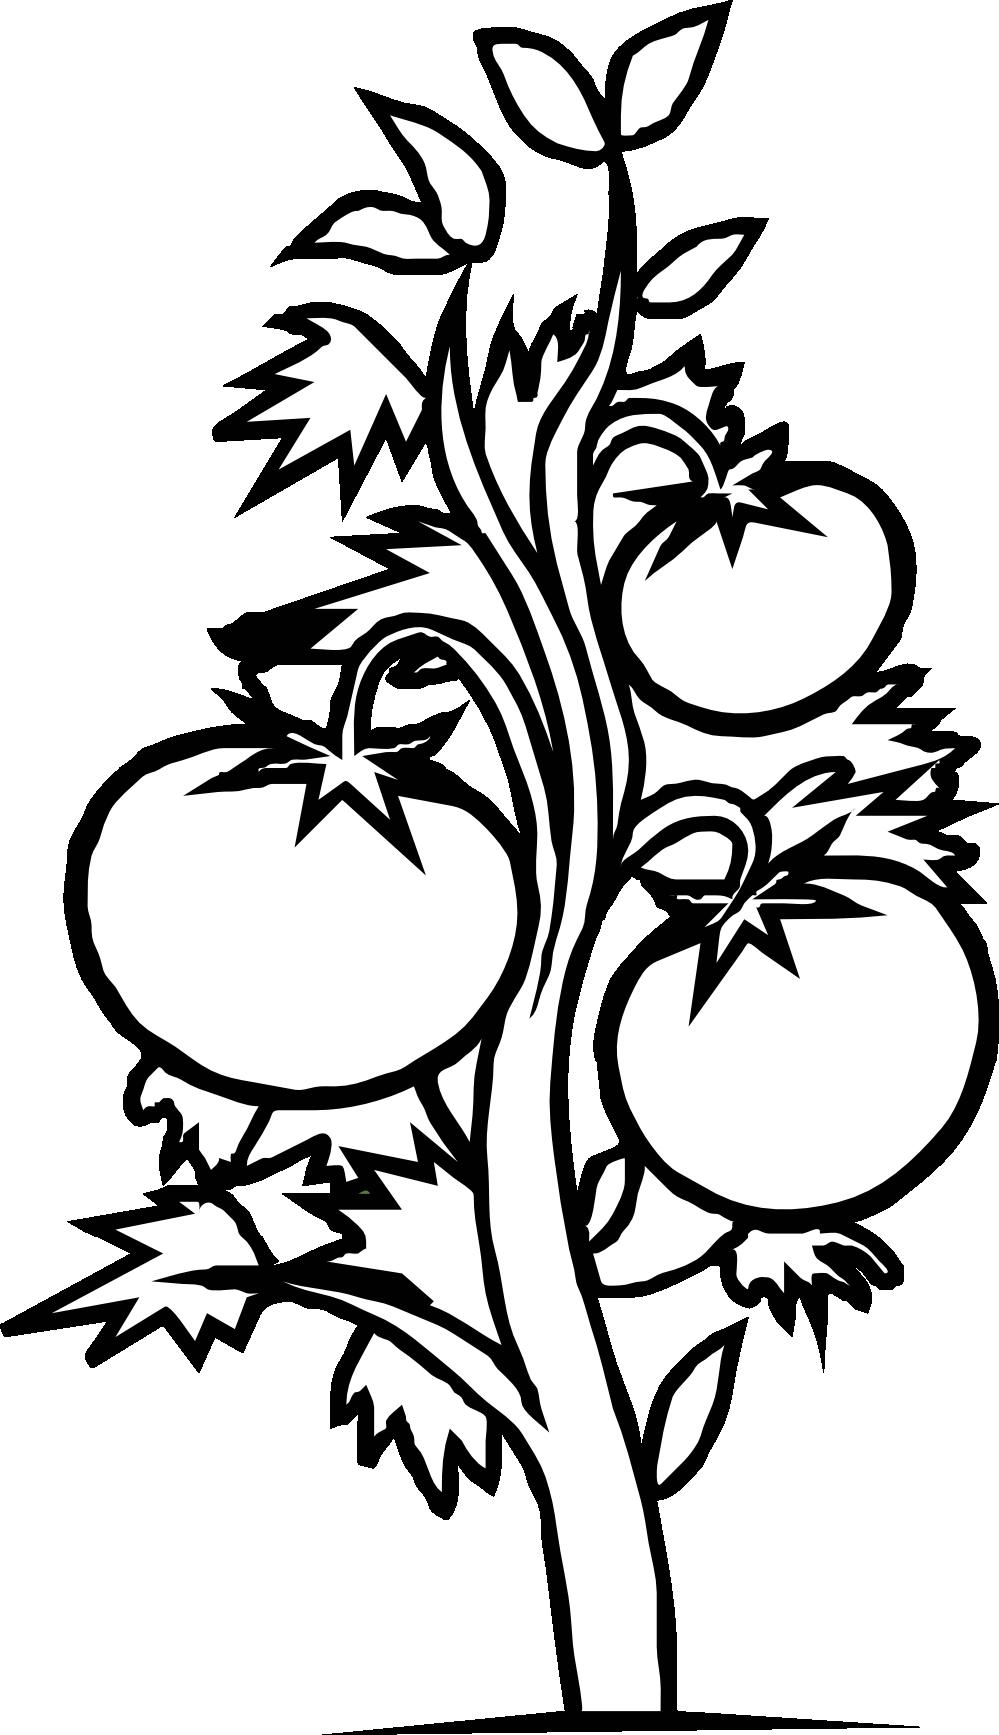 Tomato Clipart Black And White.